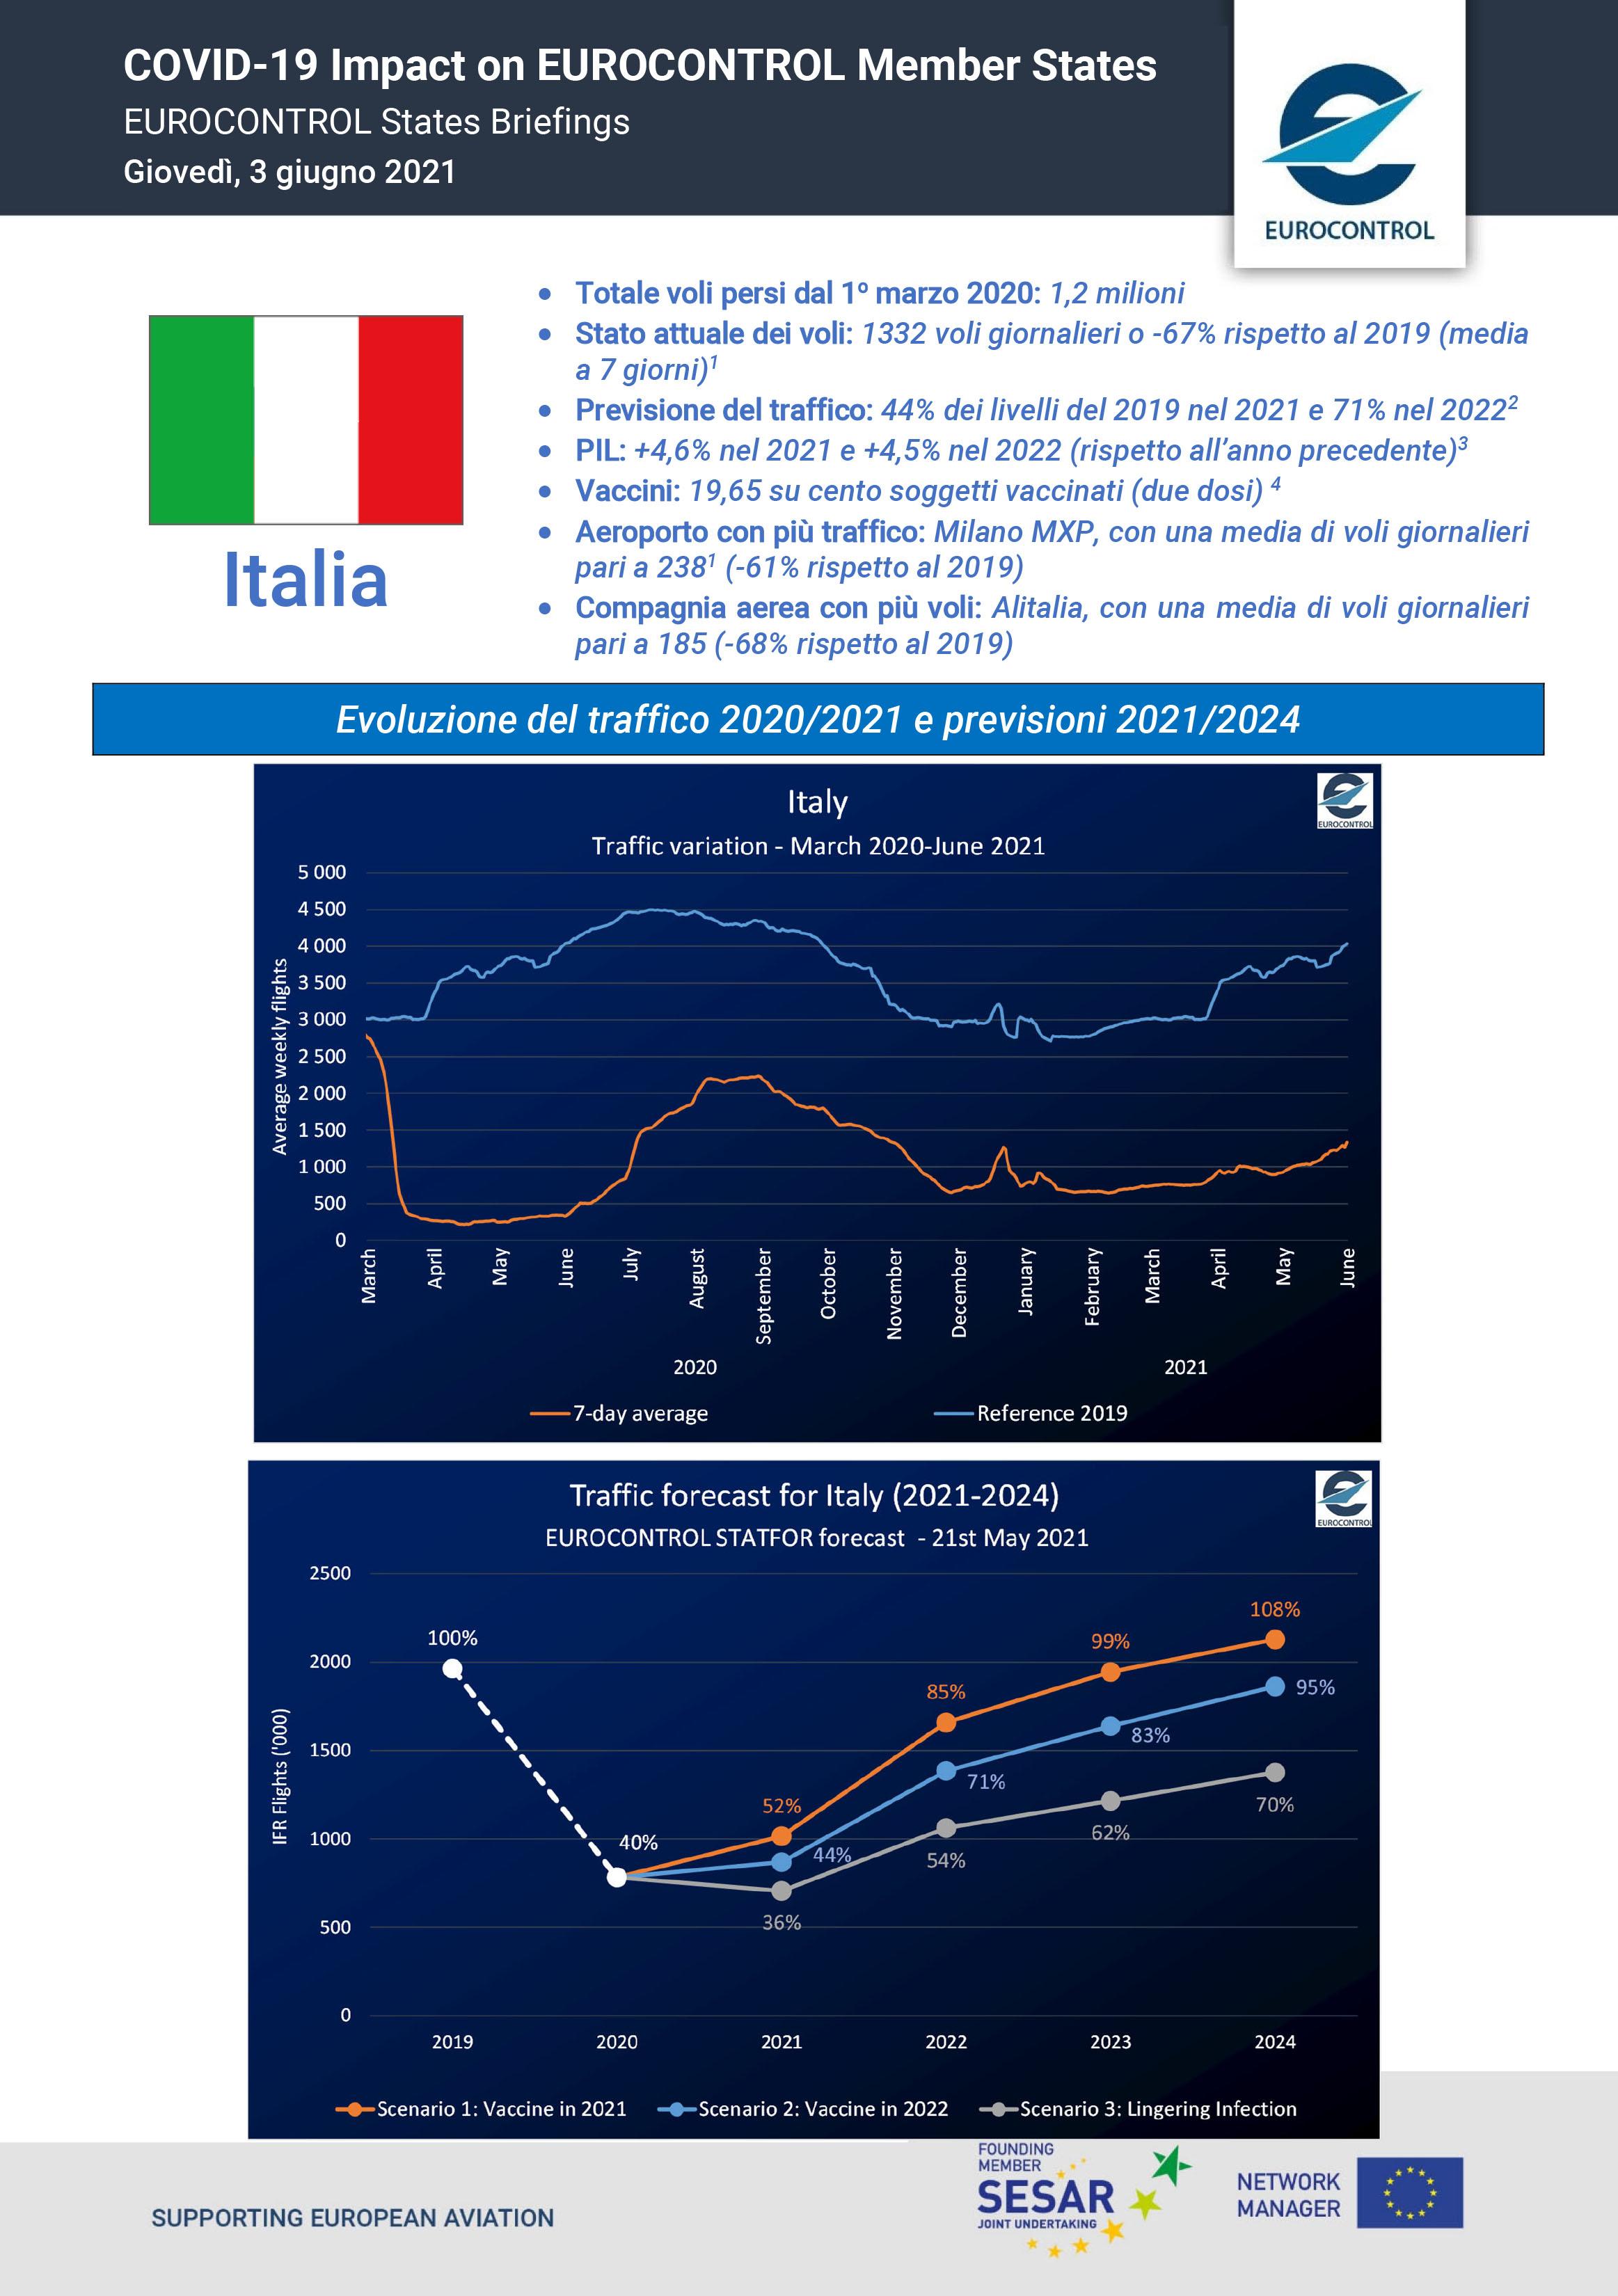 COVID 20 Impact on EUROCONTROL Member States   Italy   EUROCONTROL